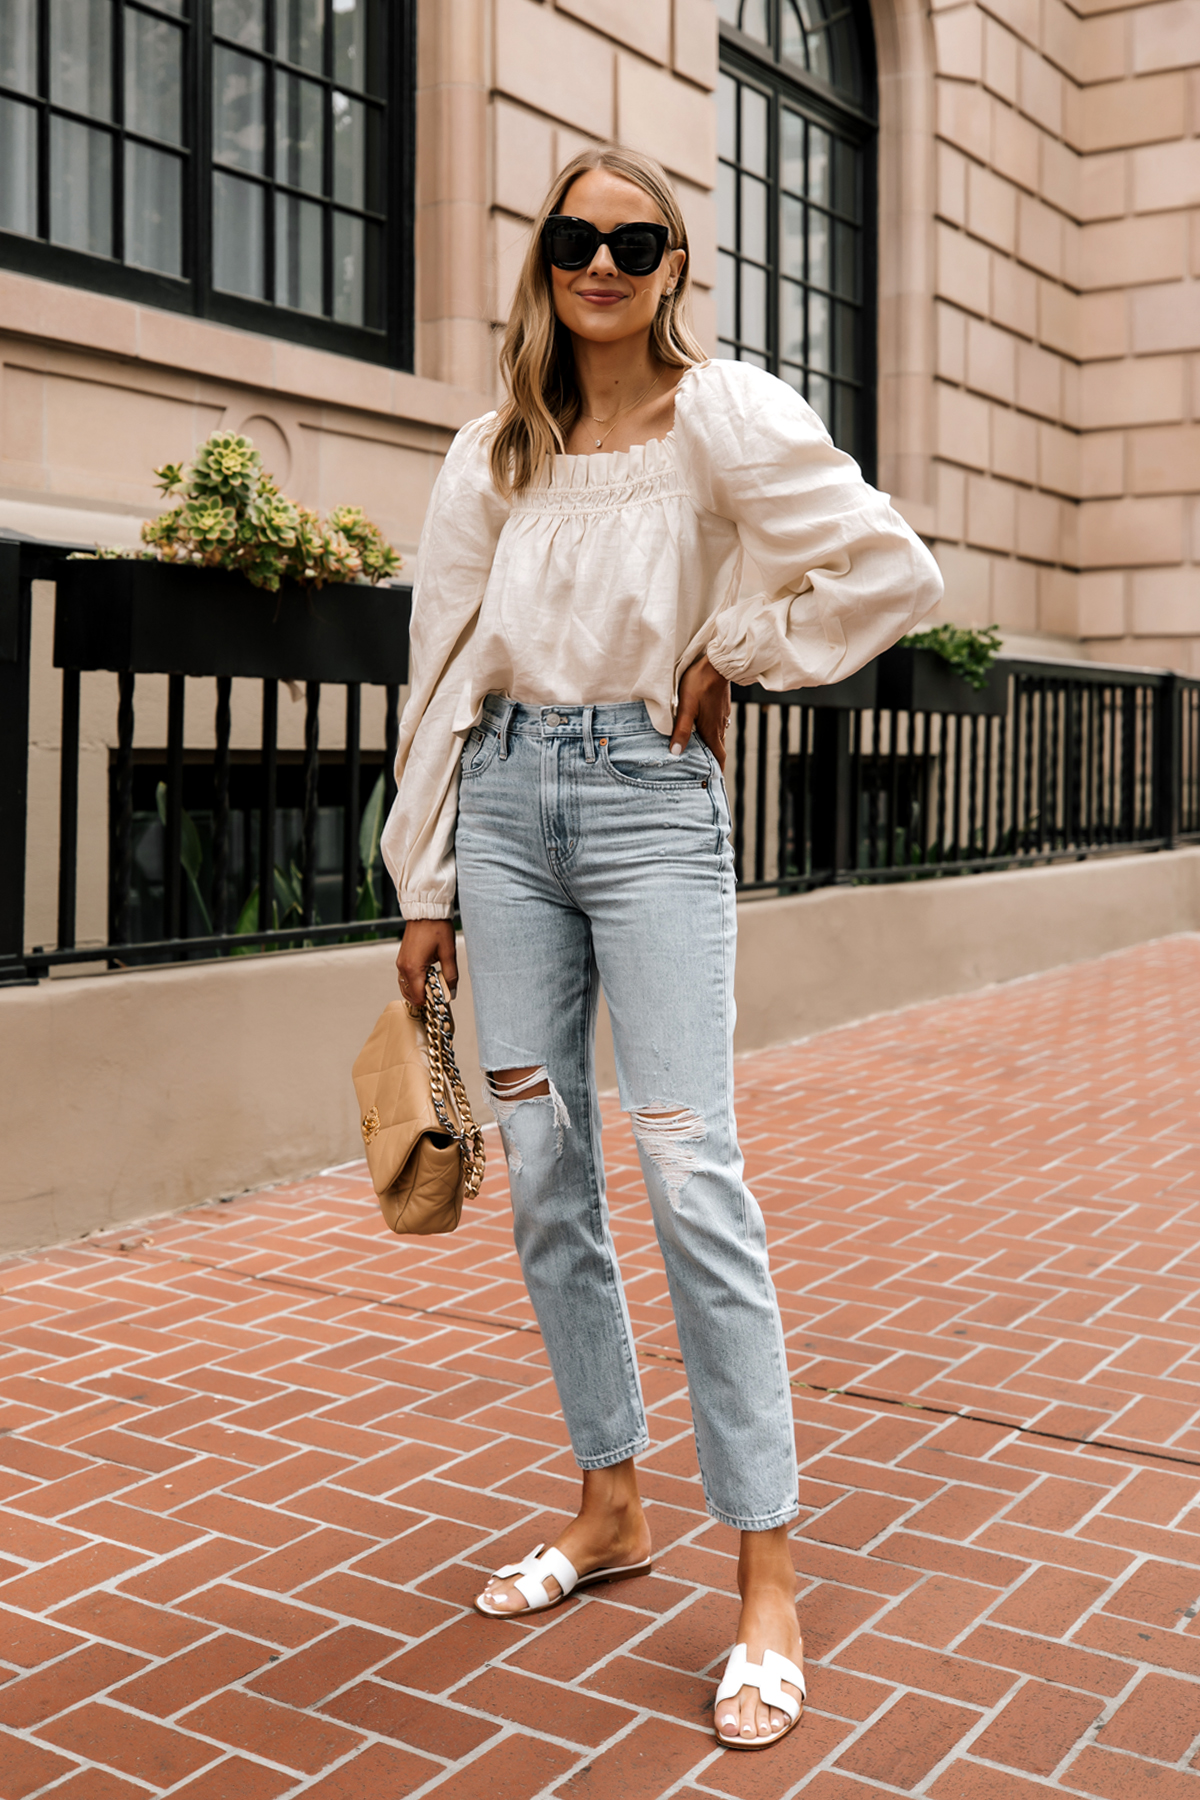 Fashion Jackson Wearing Beige Linen Puff Sleeve Top Madewell Ripped Jeans Hermes White Sandals Chanel 19 Beige Handbag 2